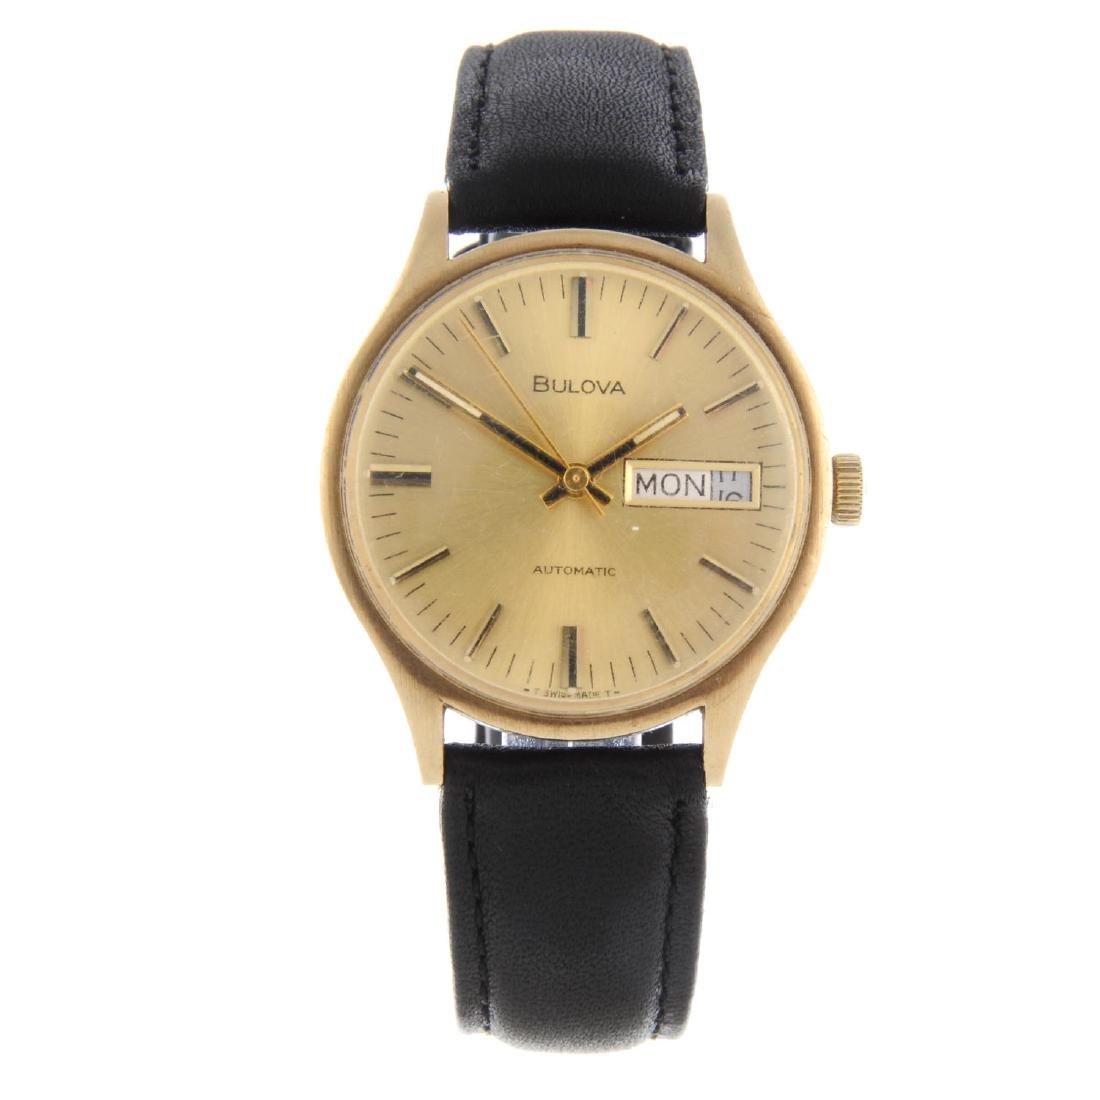 BULOVA - a gentleman's wrist watch. Yellow metal case.